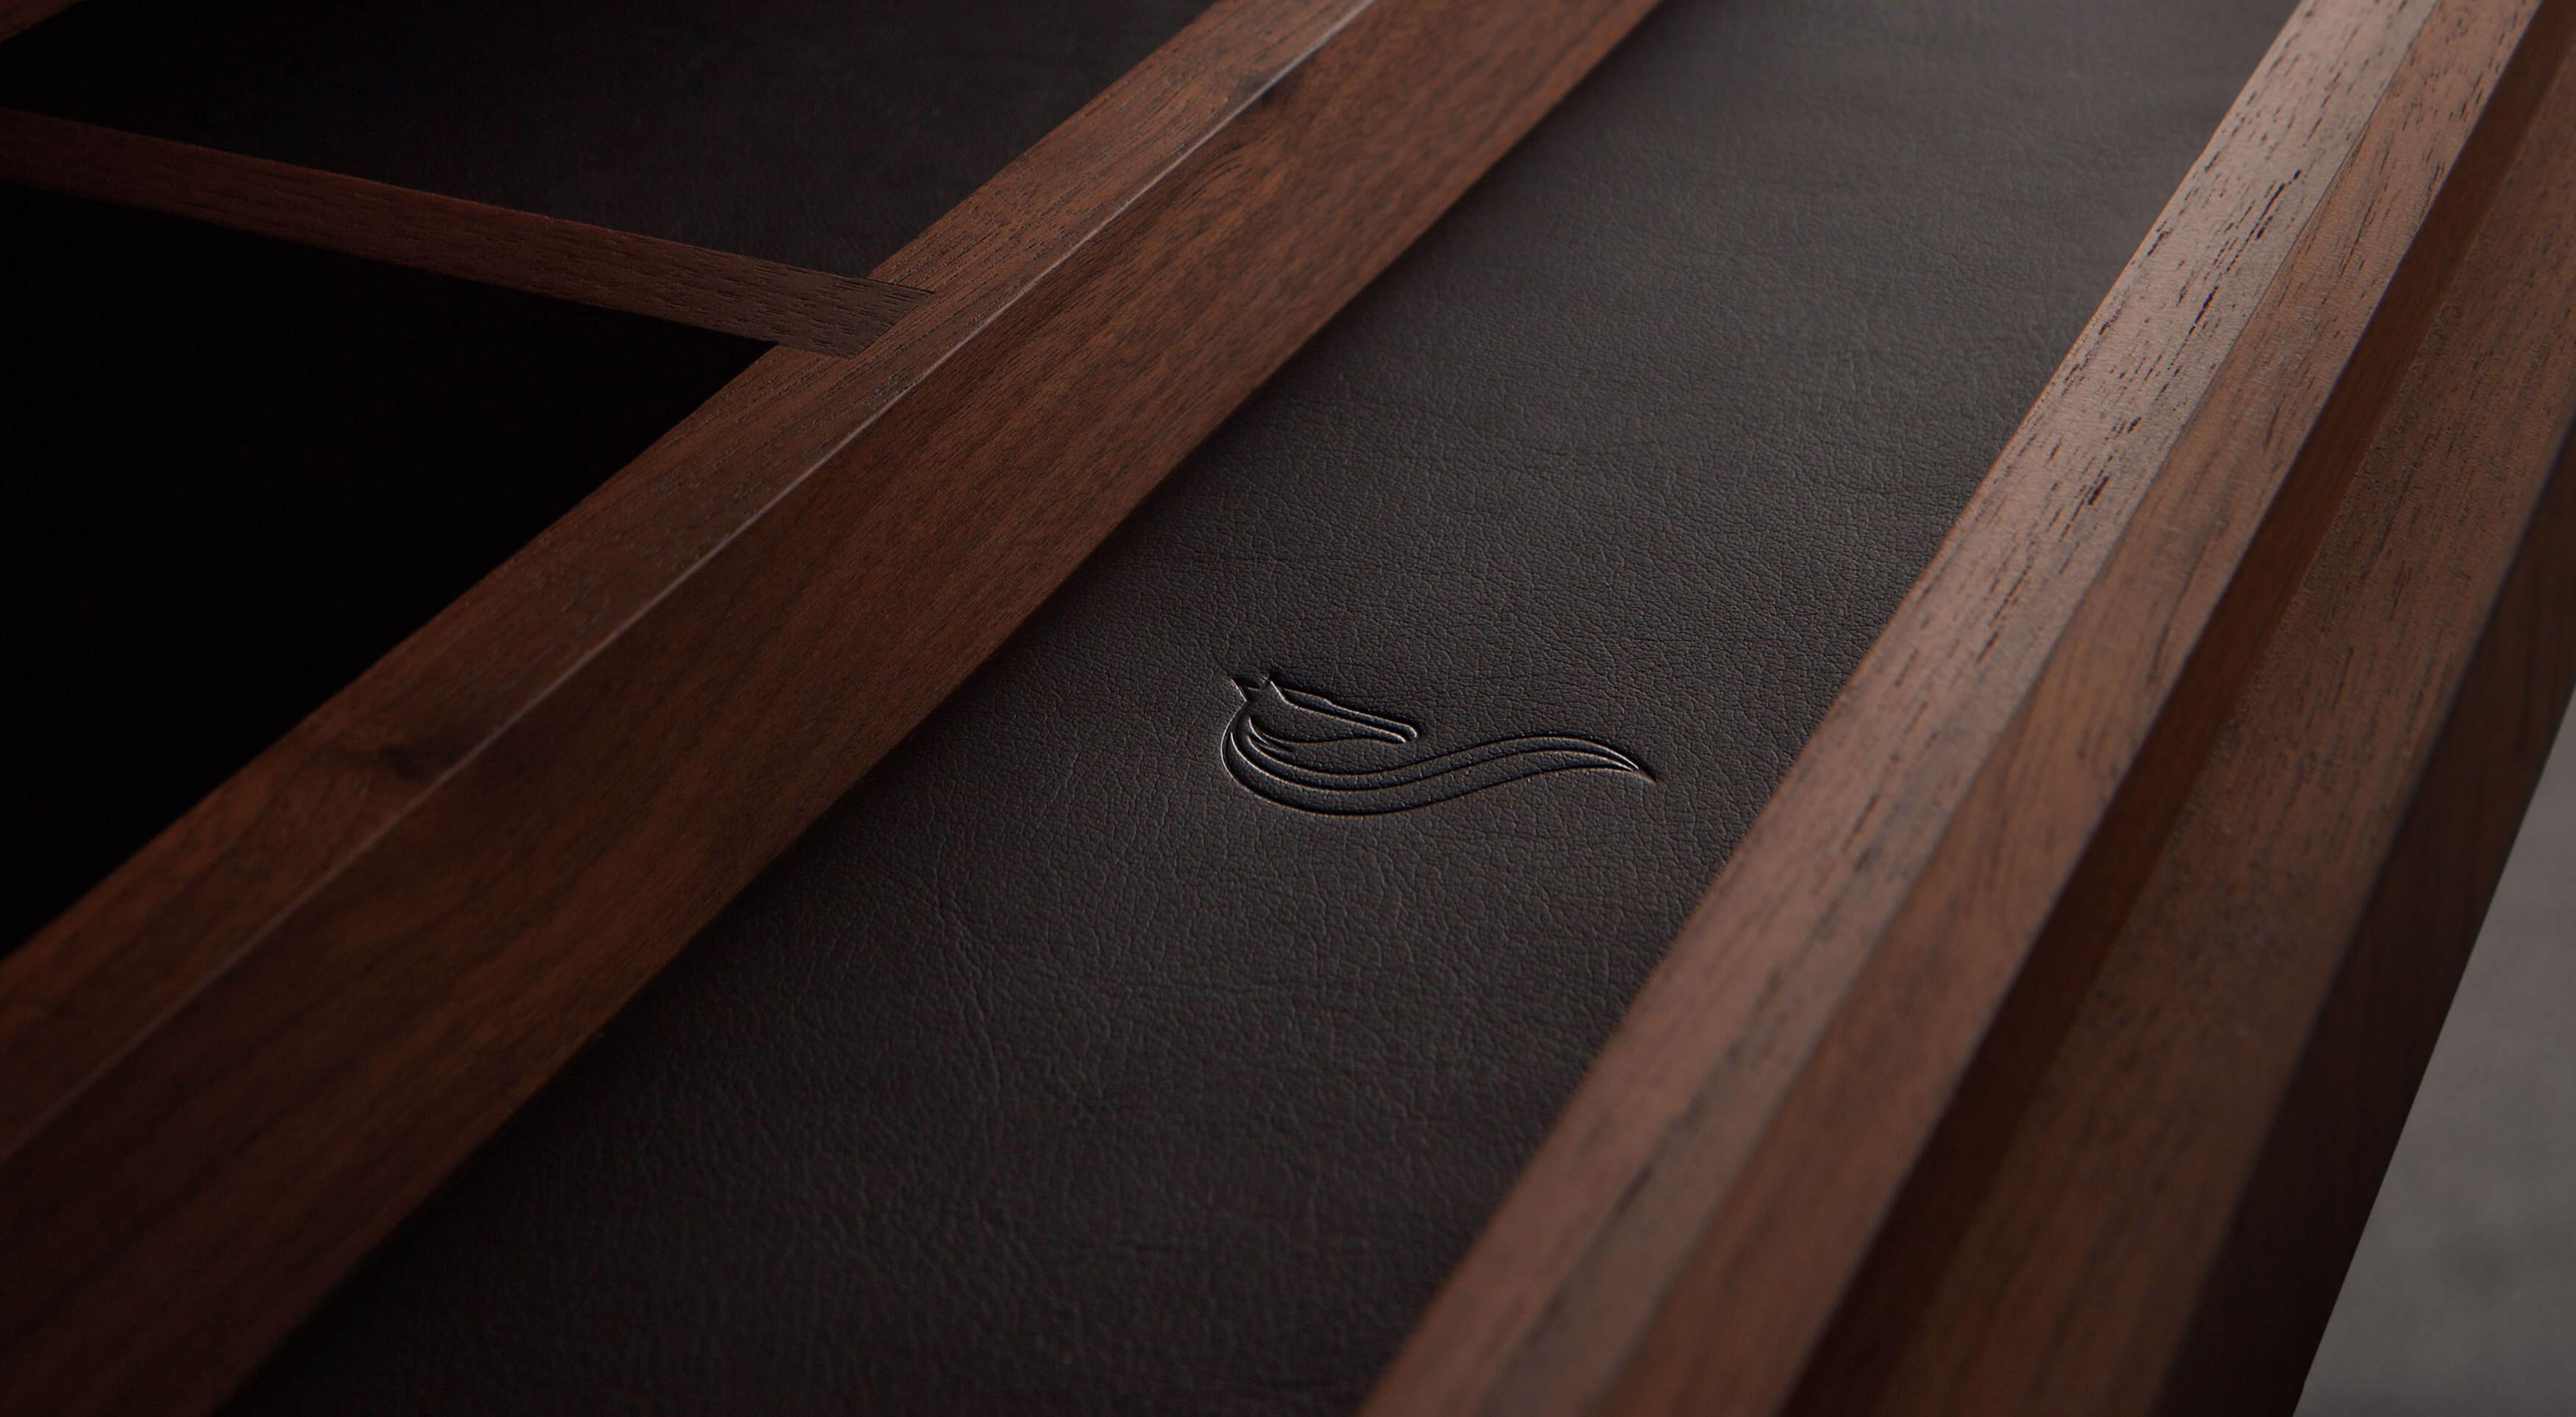 Smallbone bespoke desk draws with leather Smallbone horse logo